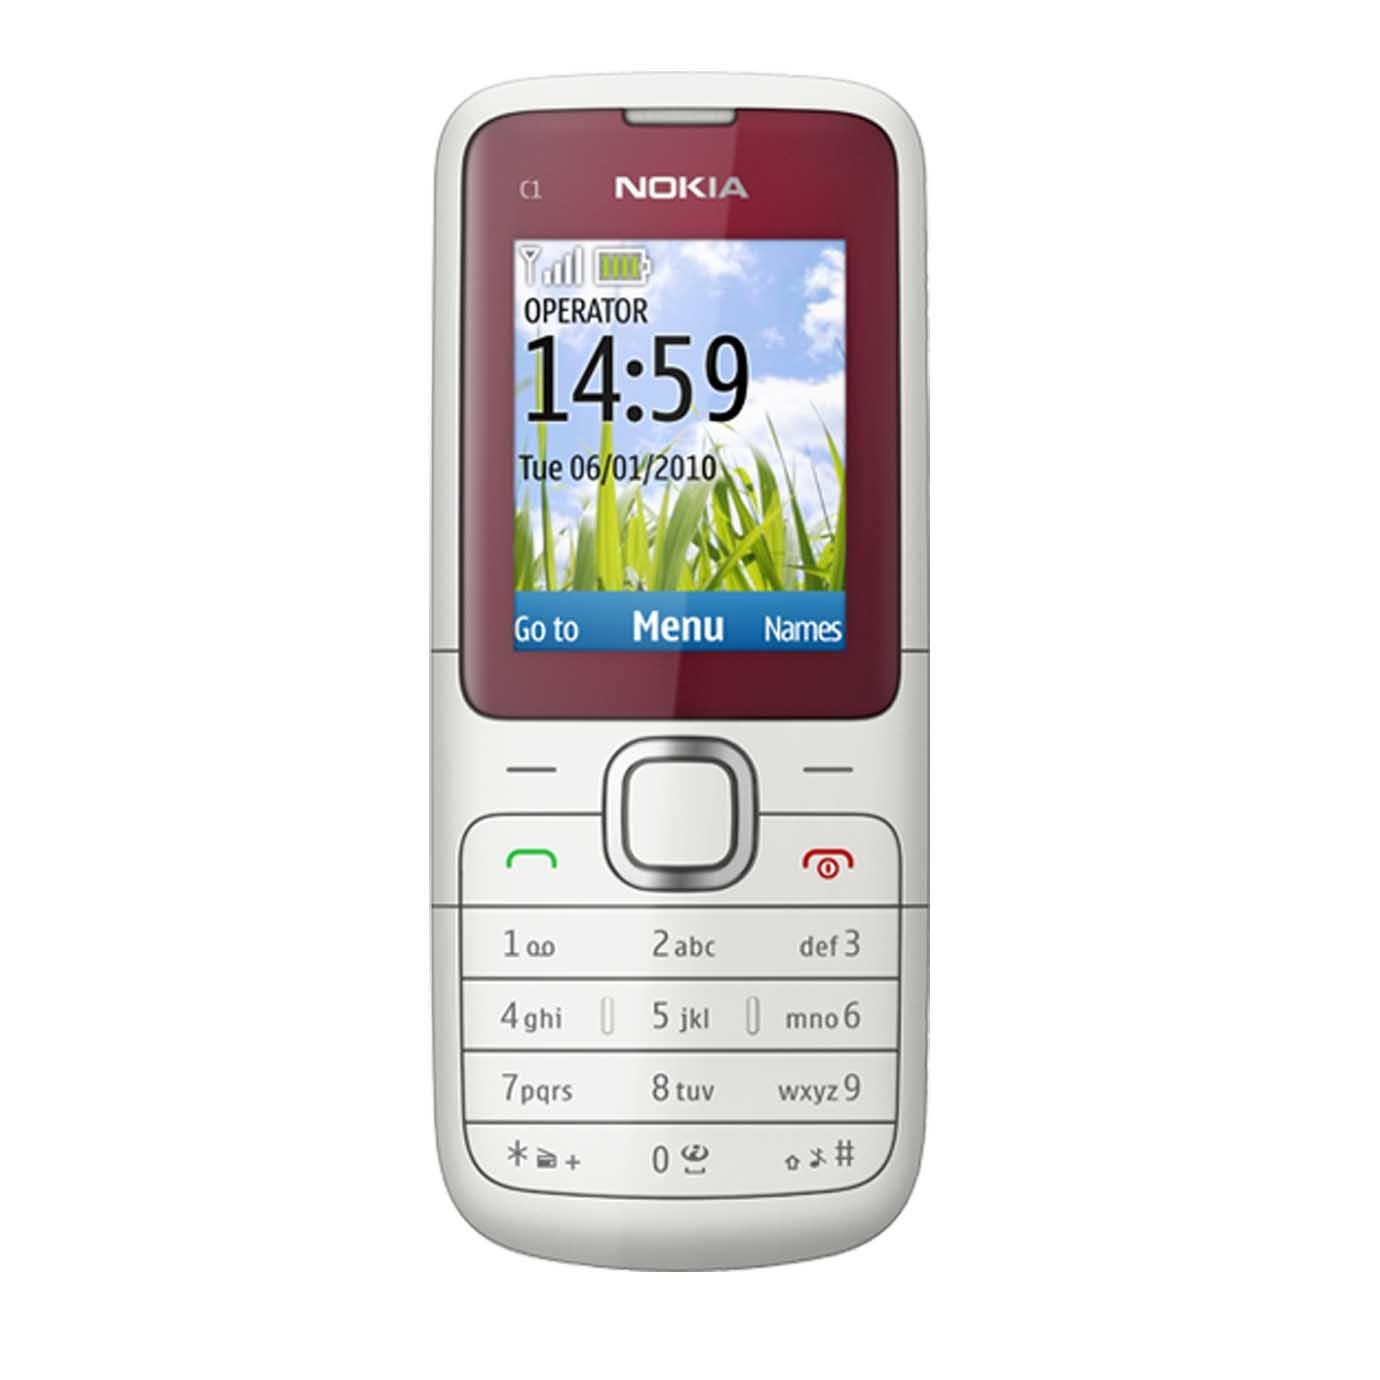 http://2.bp.blogspot.com/-4WfA9o2hZ4Q/UBzEzvgKqeI/AAAAAAAACBw/ffPXQIWAMkQ/s1600/Nokia%2BC1-01%2B(Red).jpg